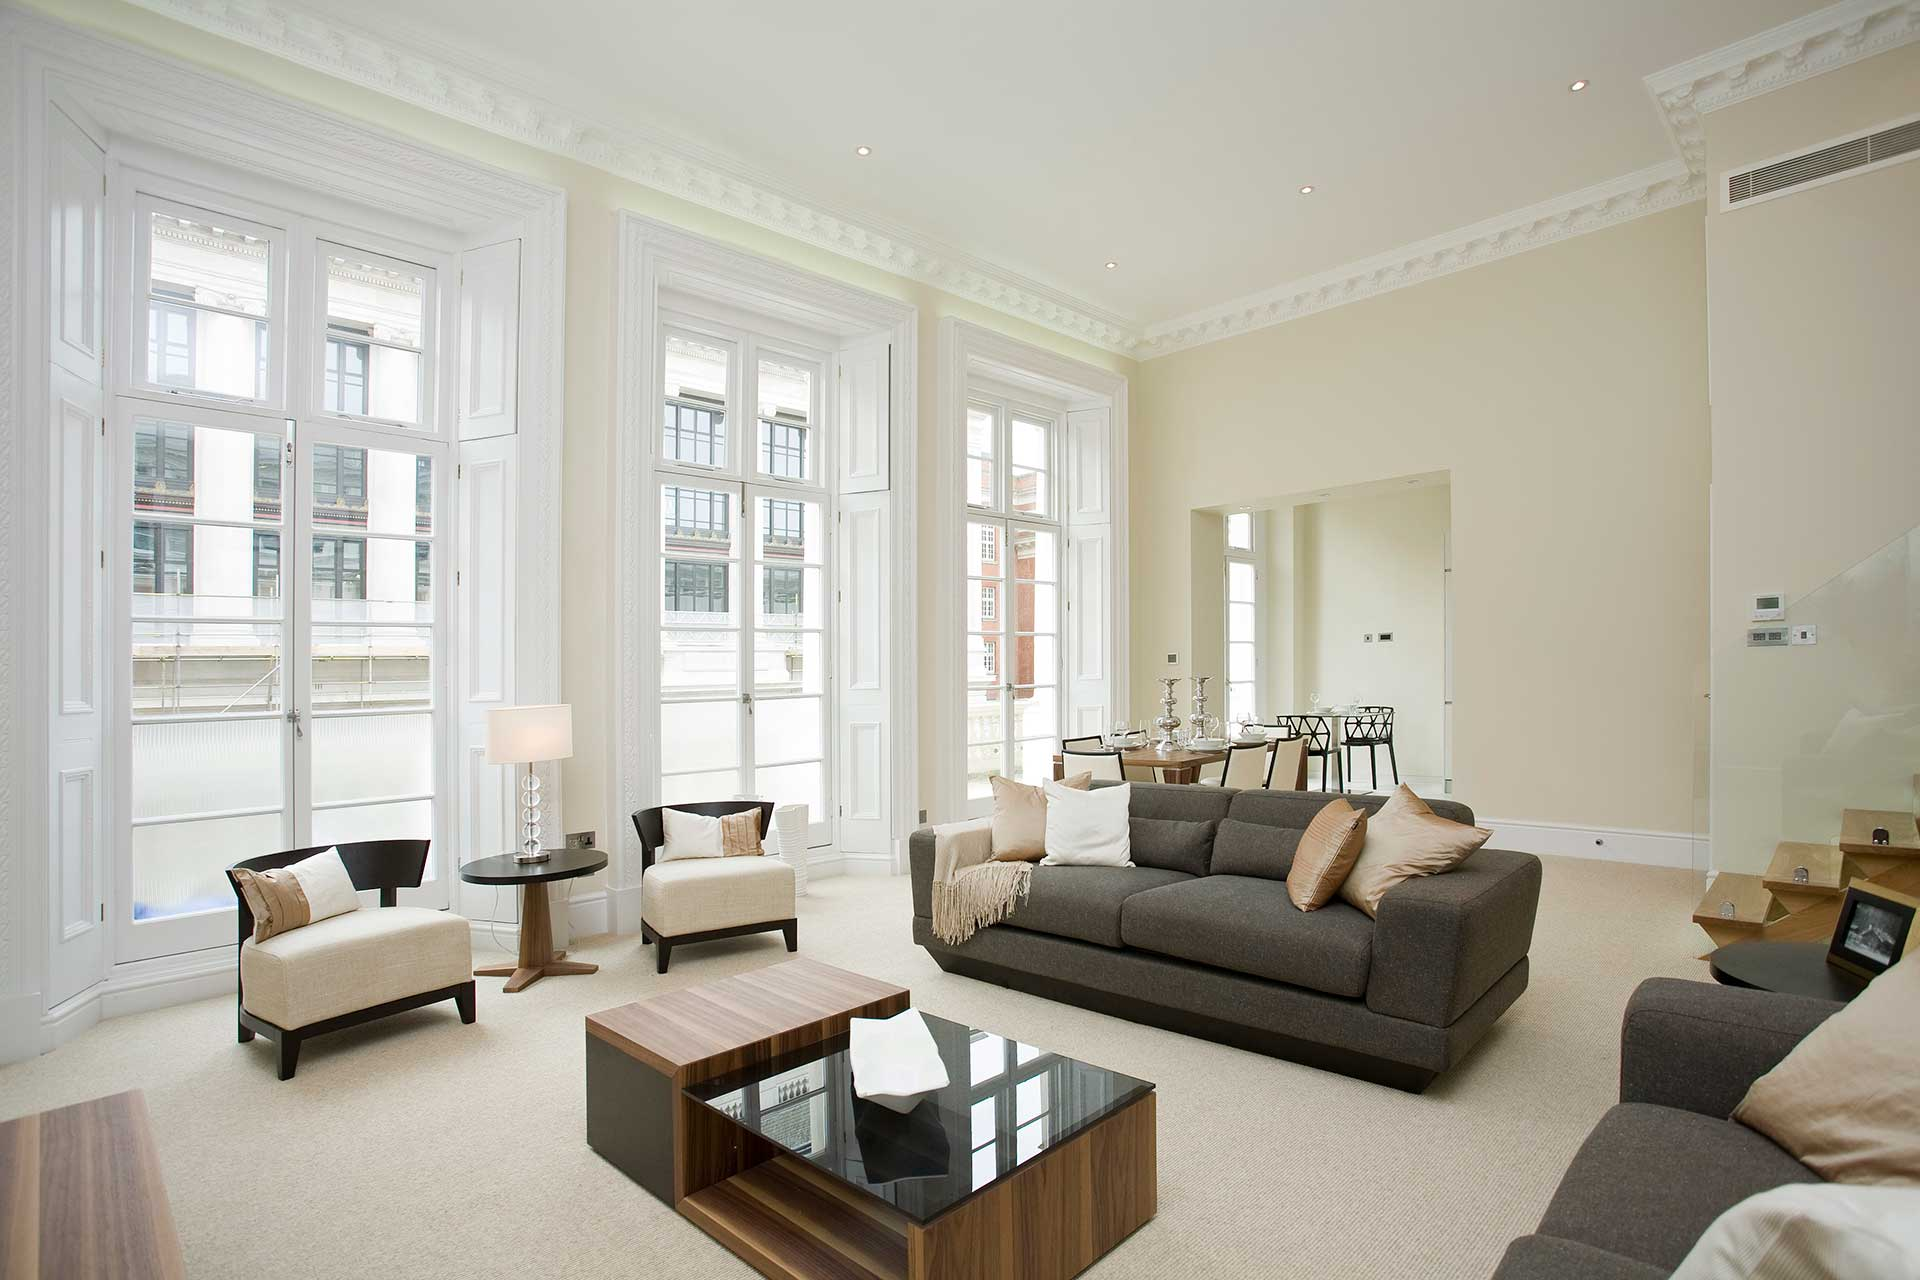 Living Room after Refurbishment